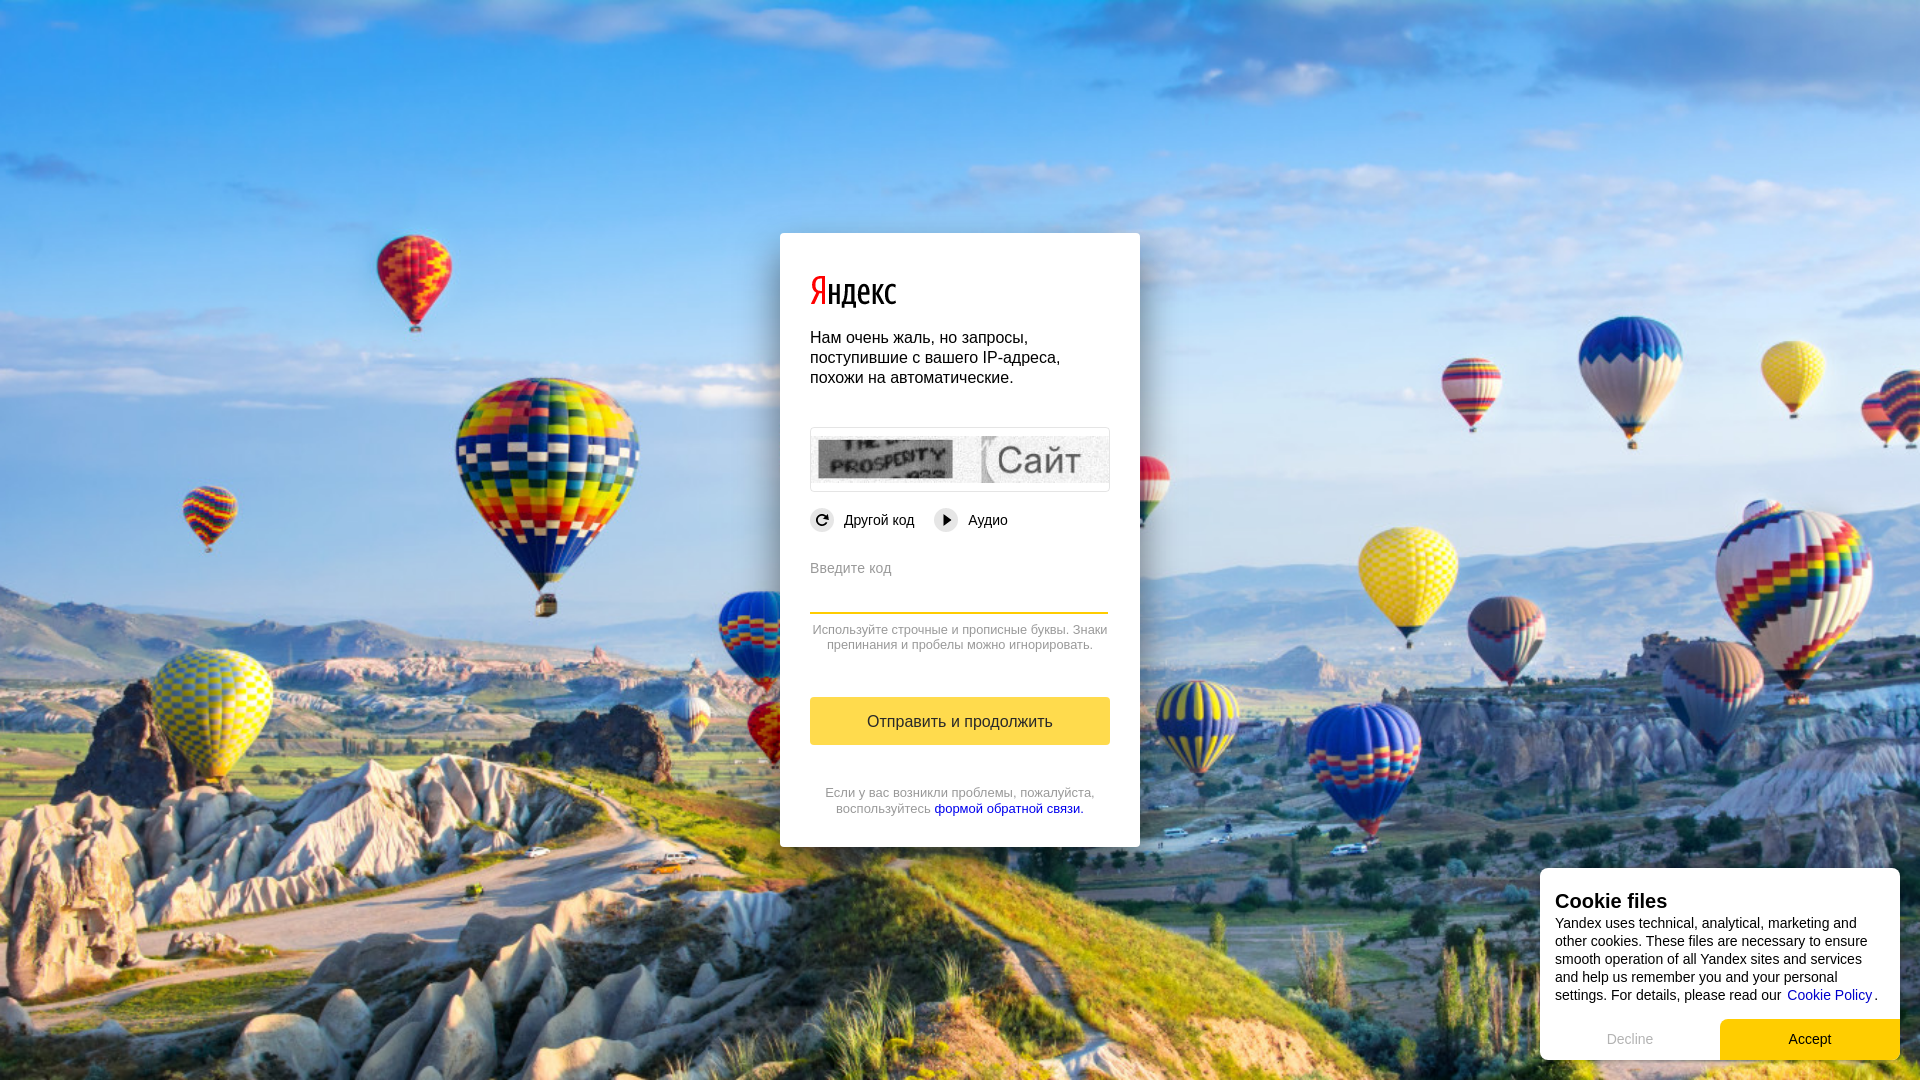 Afisha.yandex.ru website